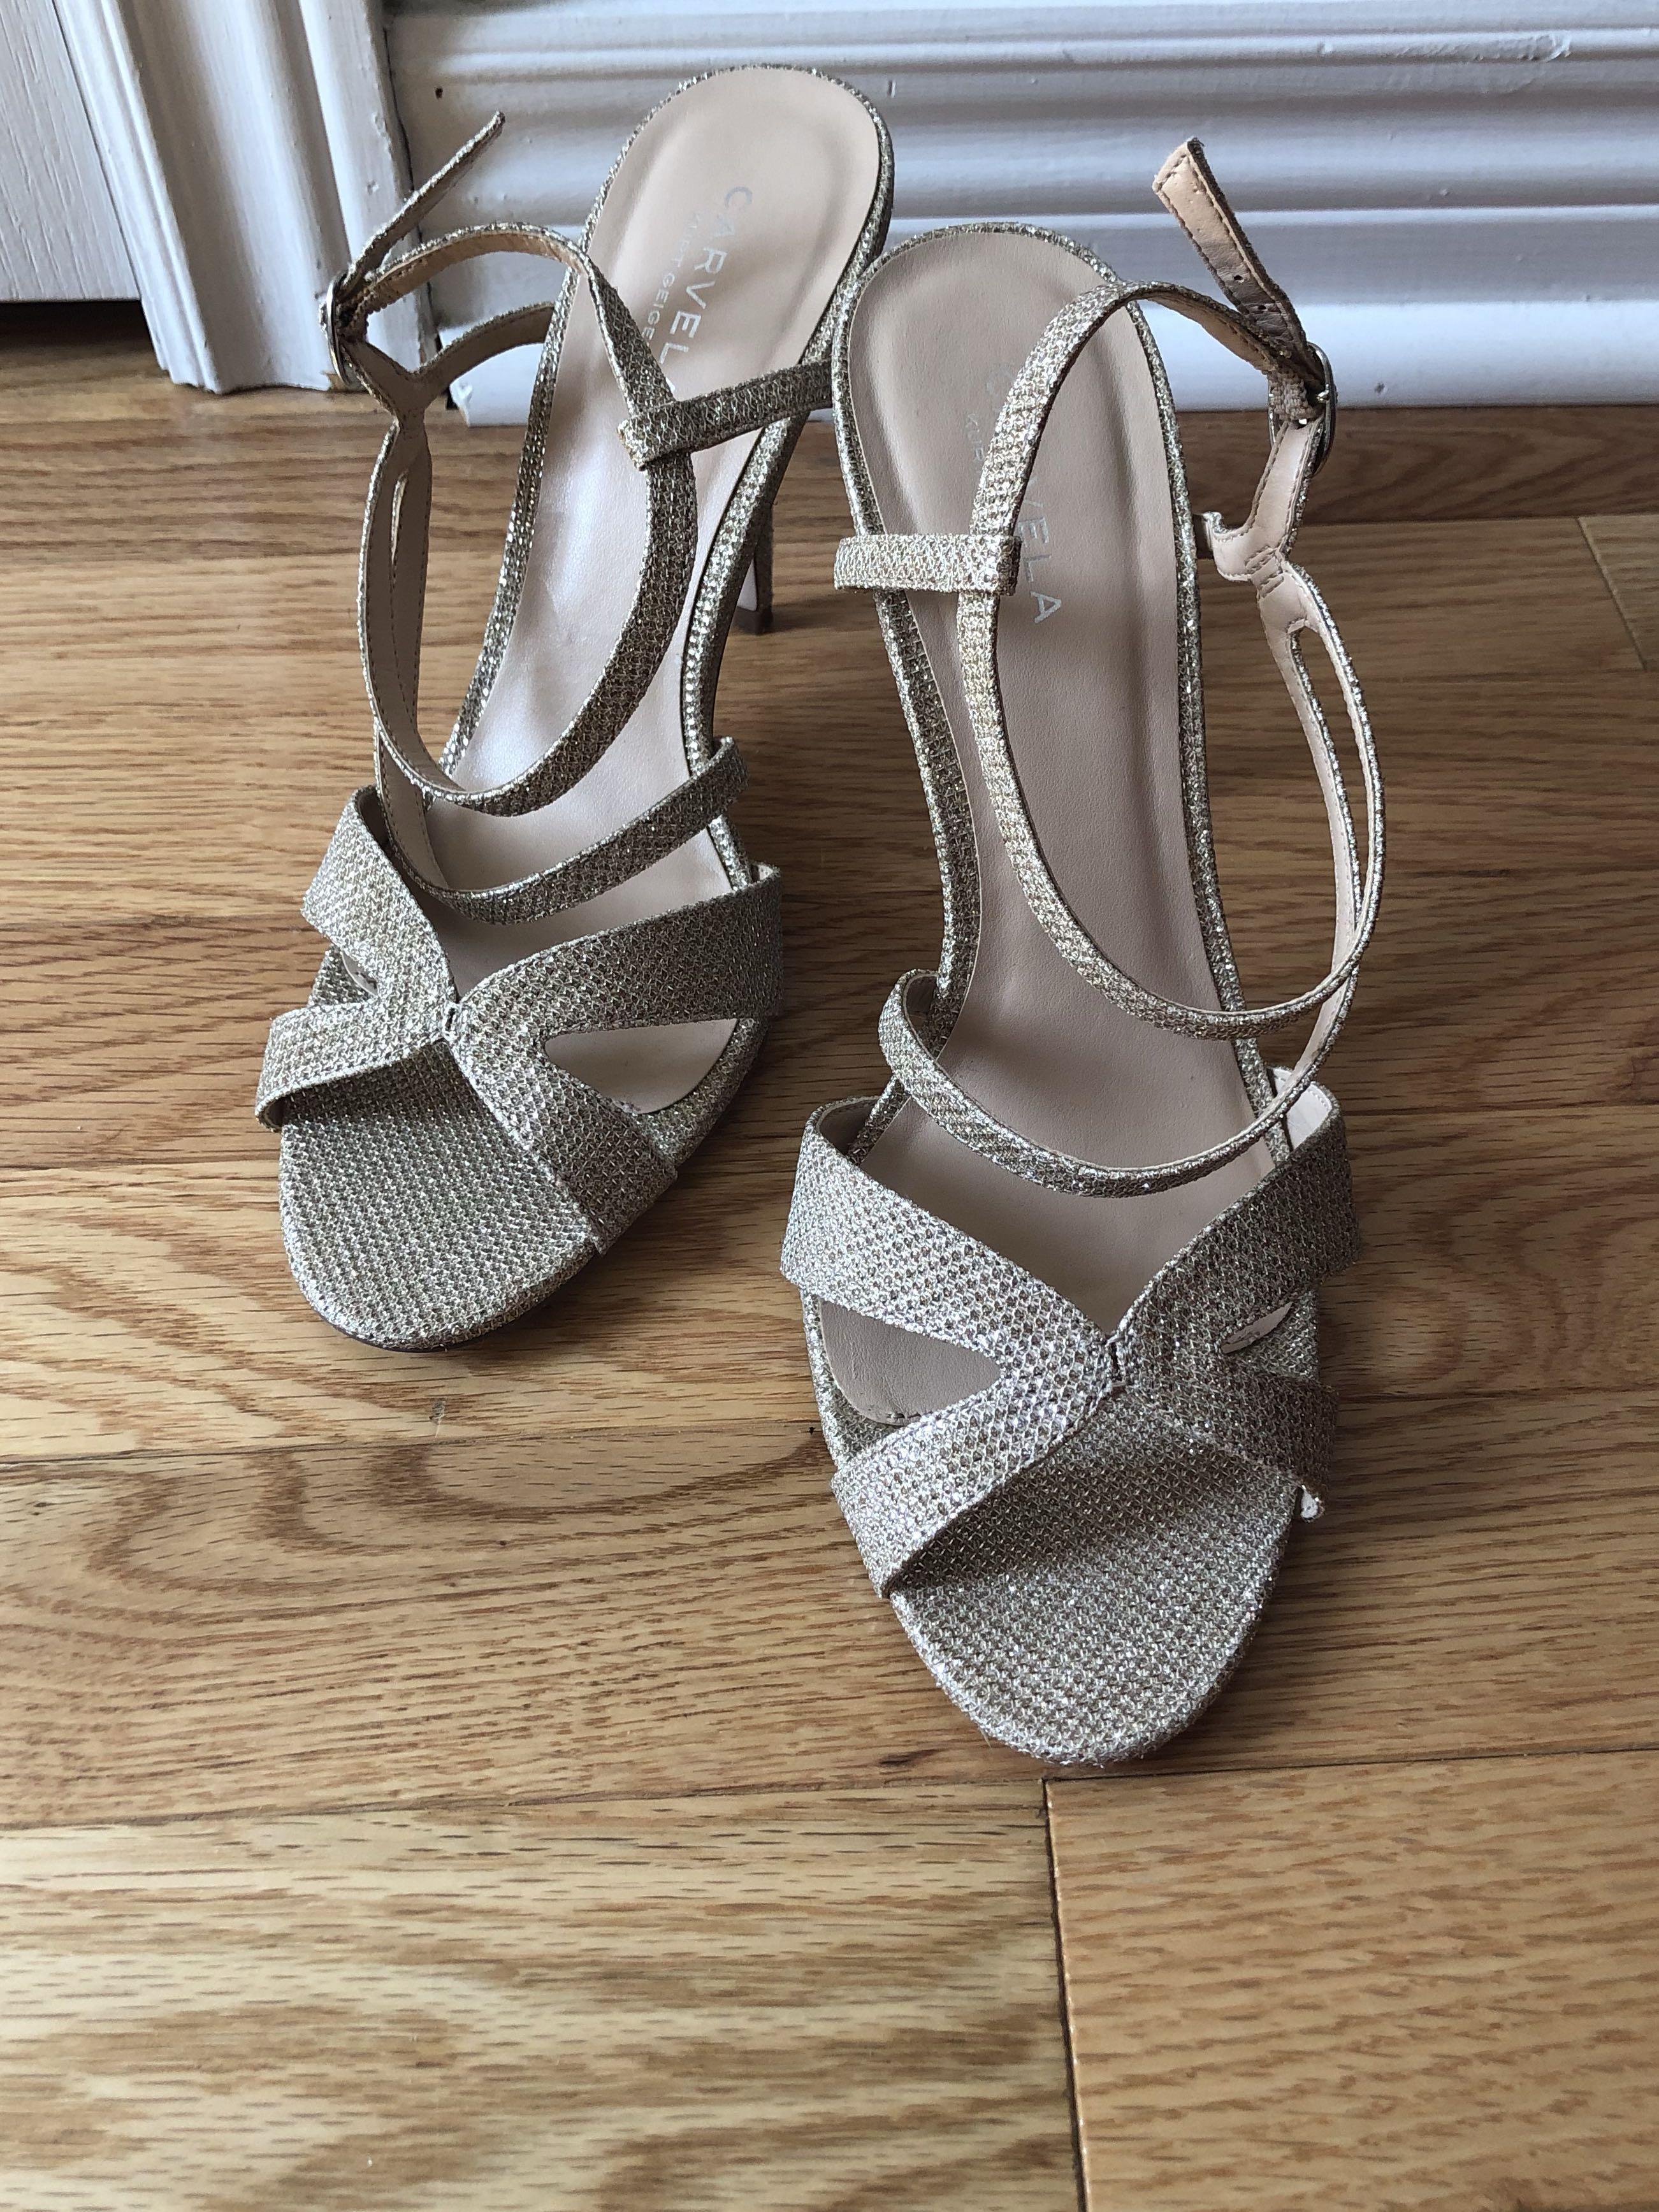 Carvela Kurt Geiger Metallic Ladybird High Heel Sandals